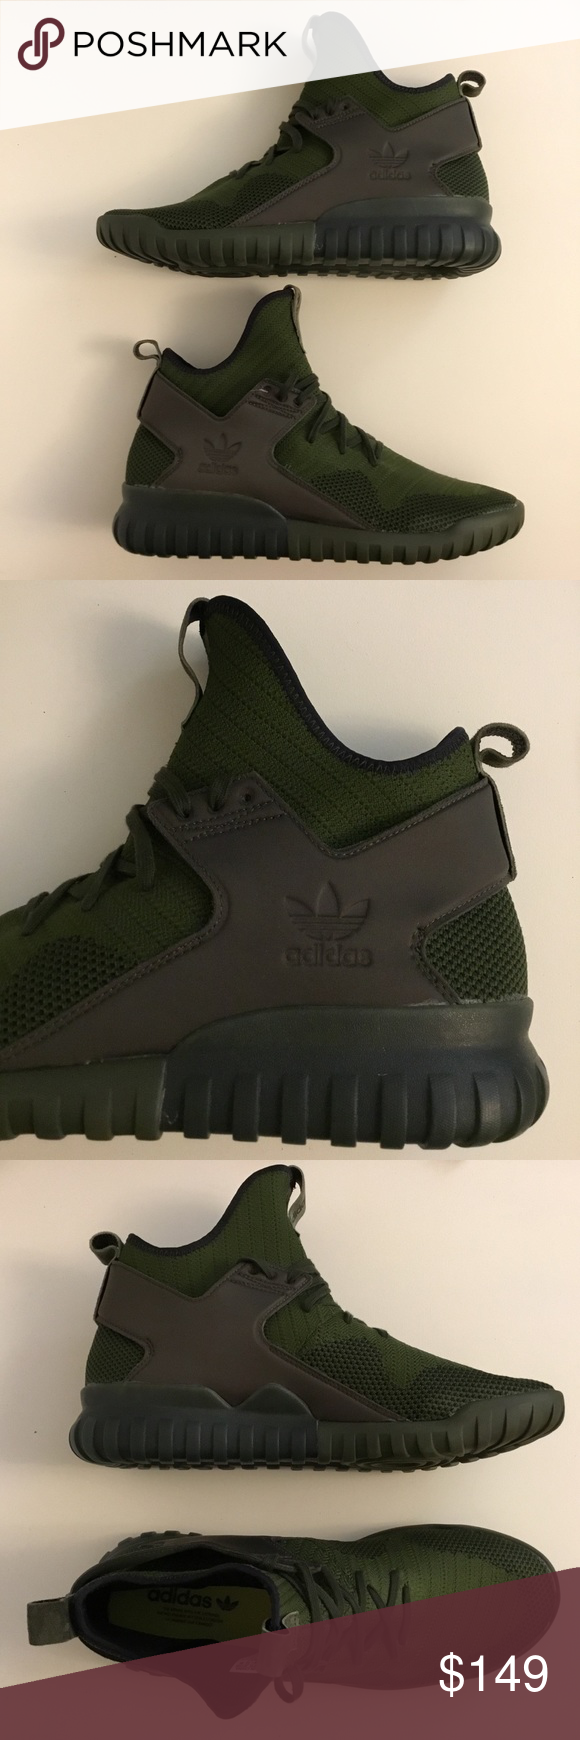 Adidas originali tubulare x scarpe alte nwt adidas